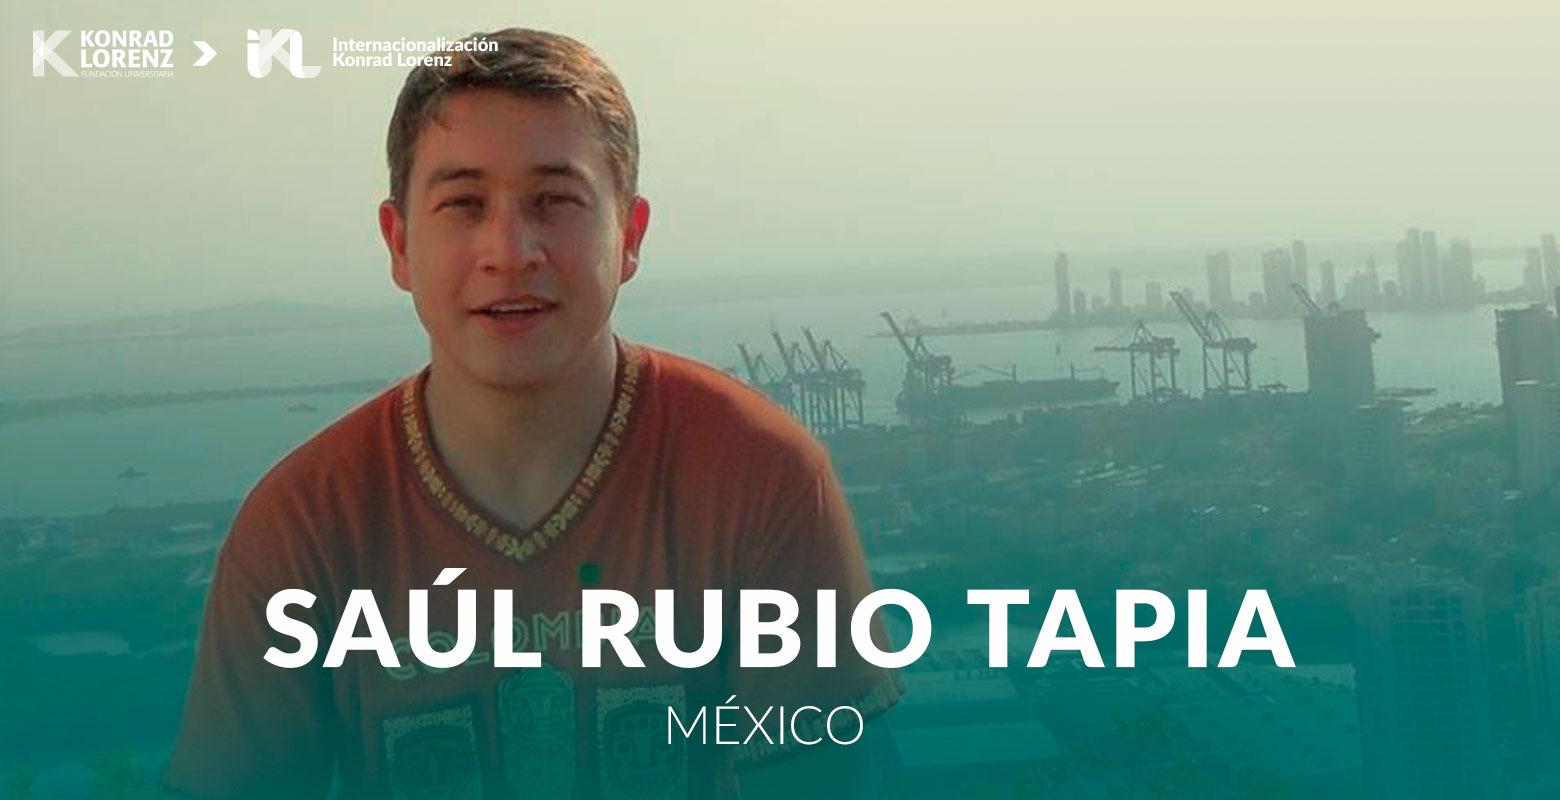 Saúl Rubio Tapia